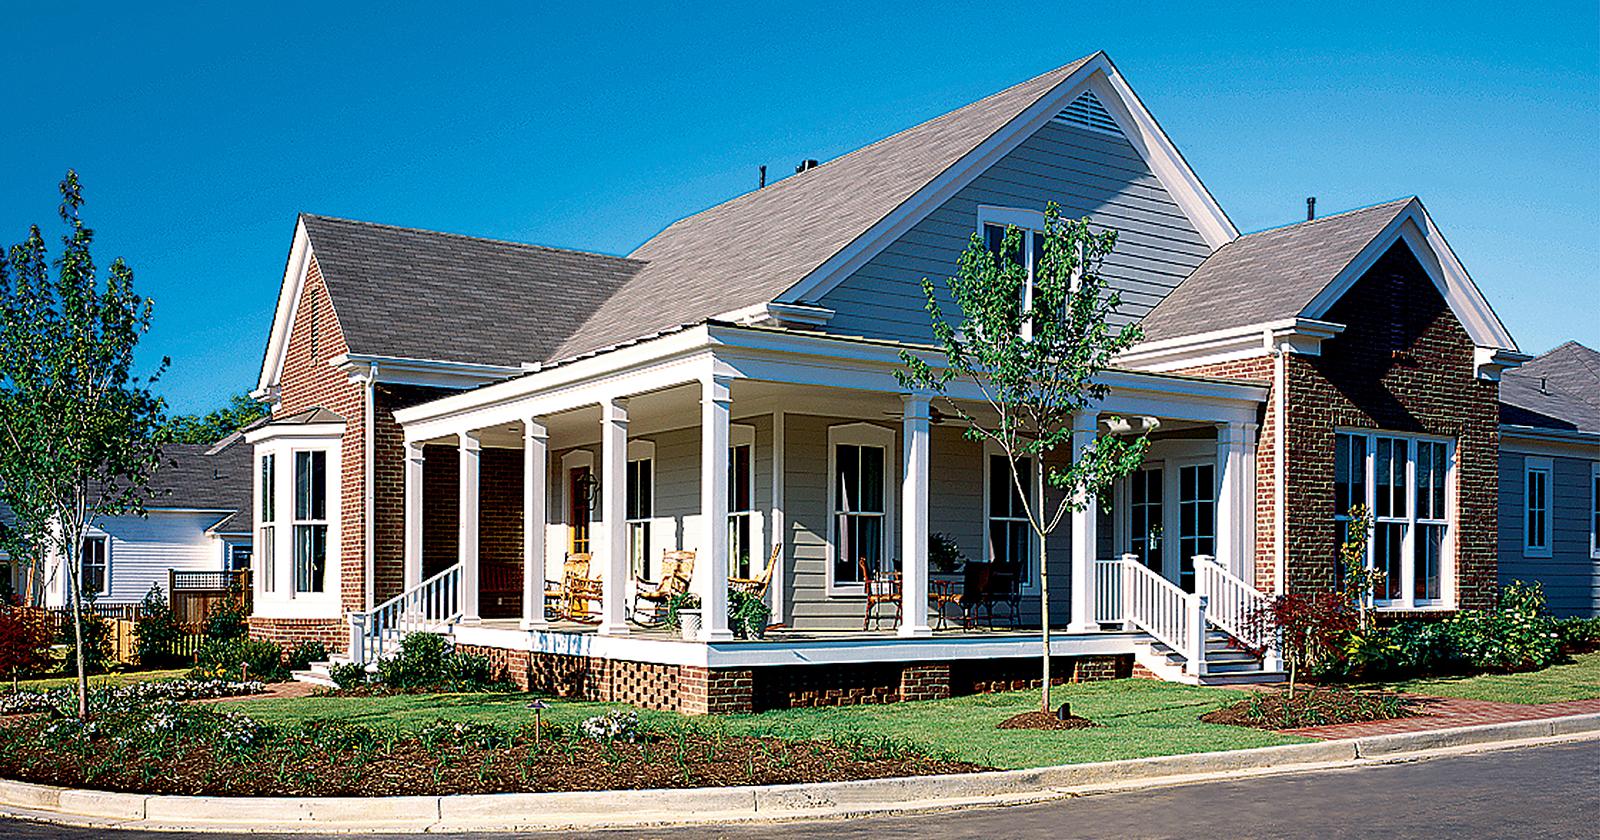 Southern Living Idea House, Poplar Grove, Collierville, TN